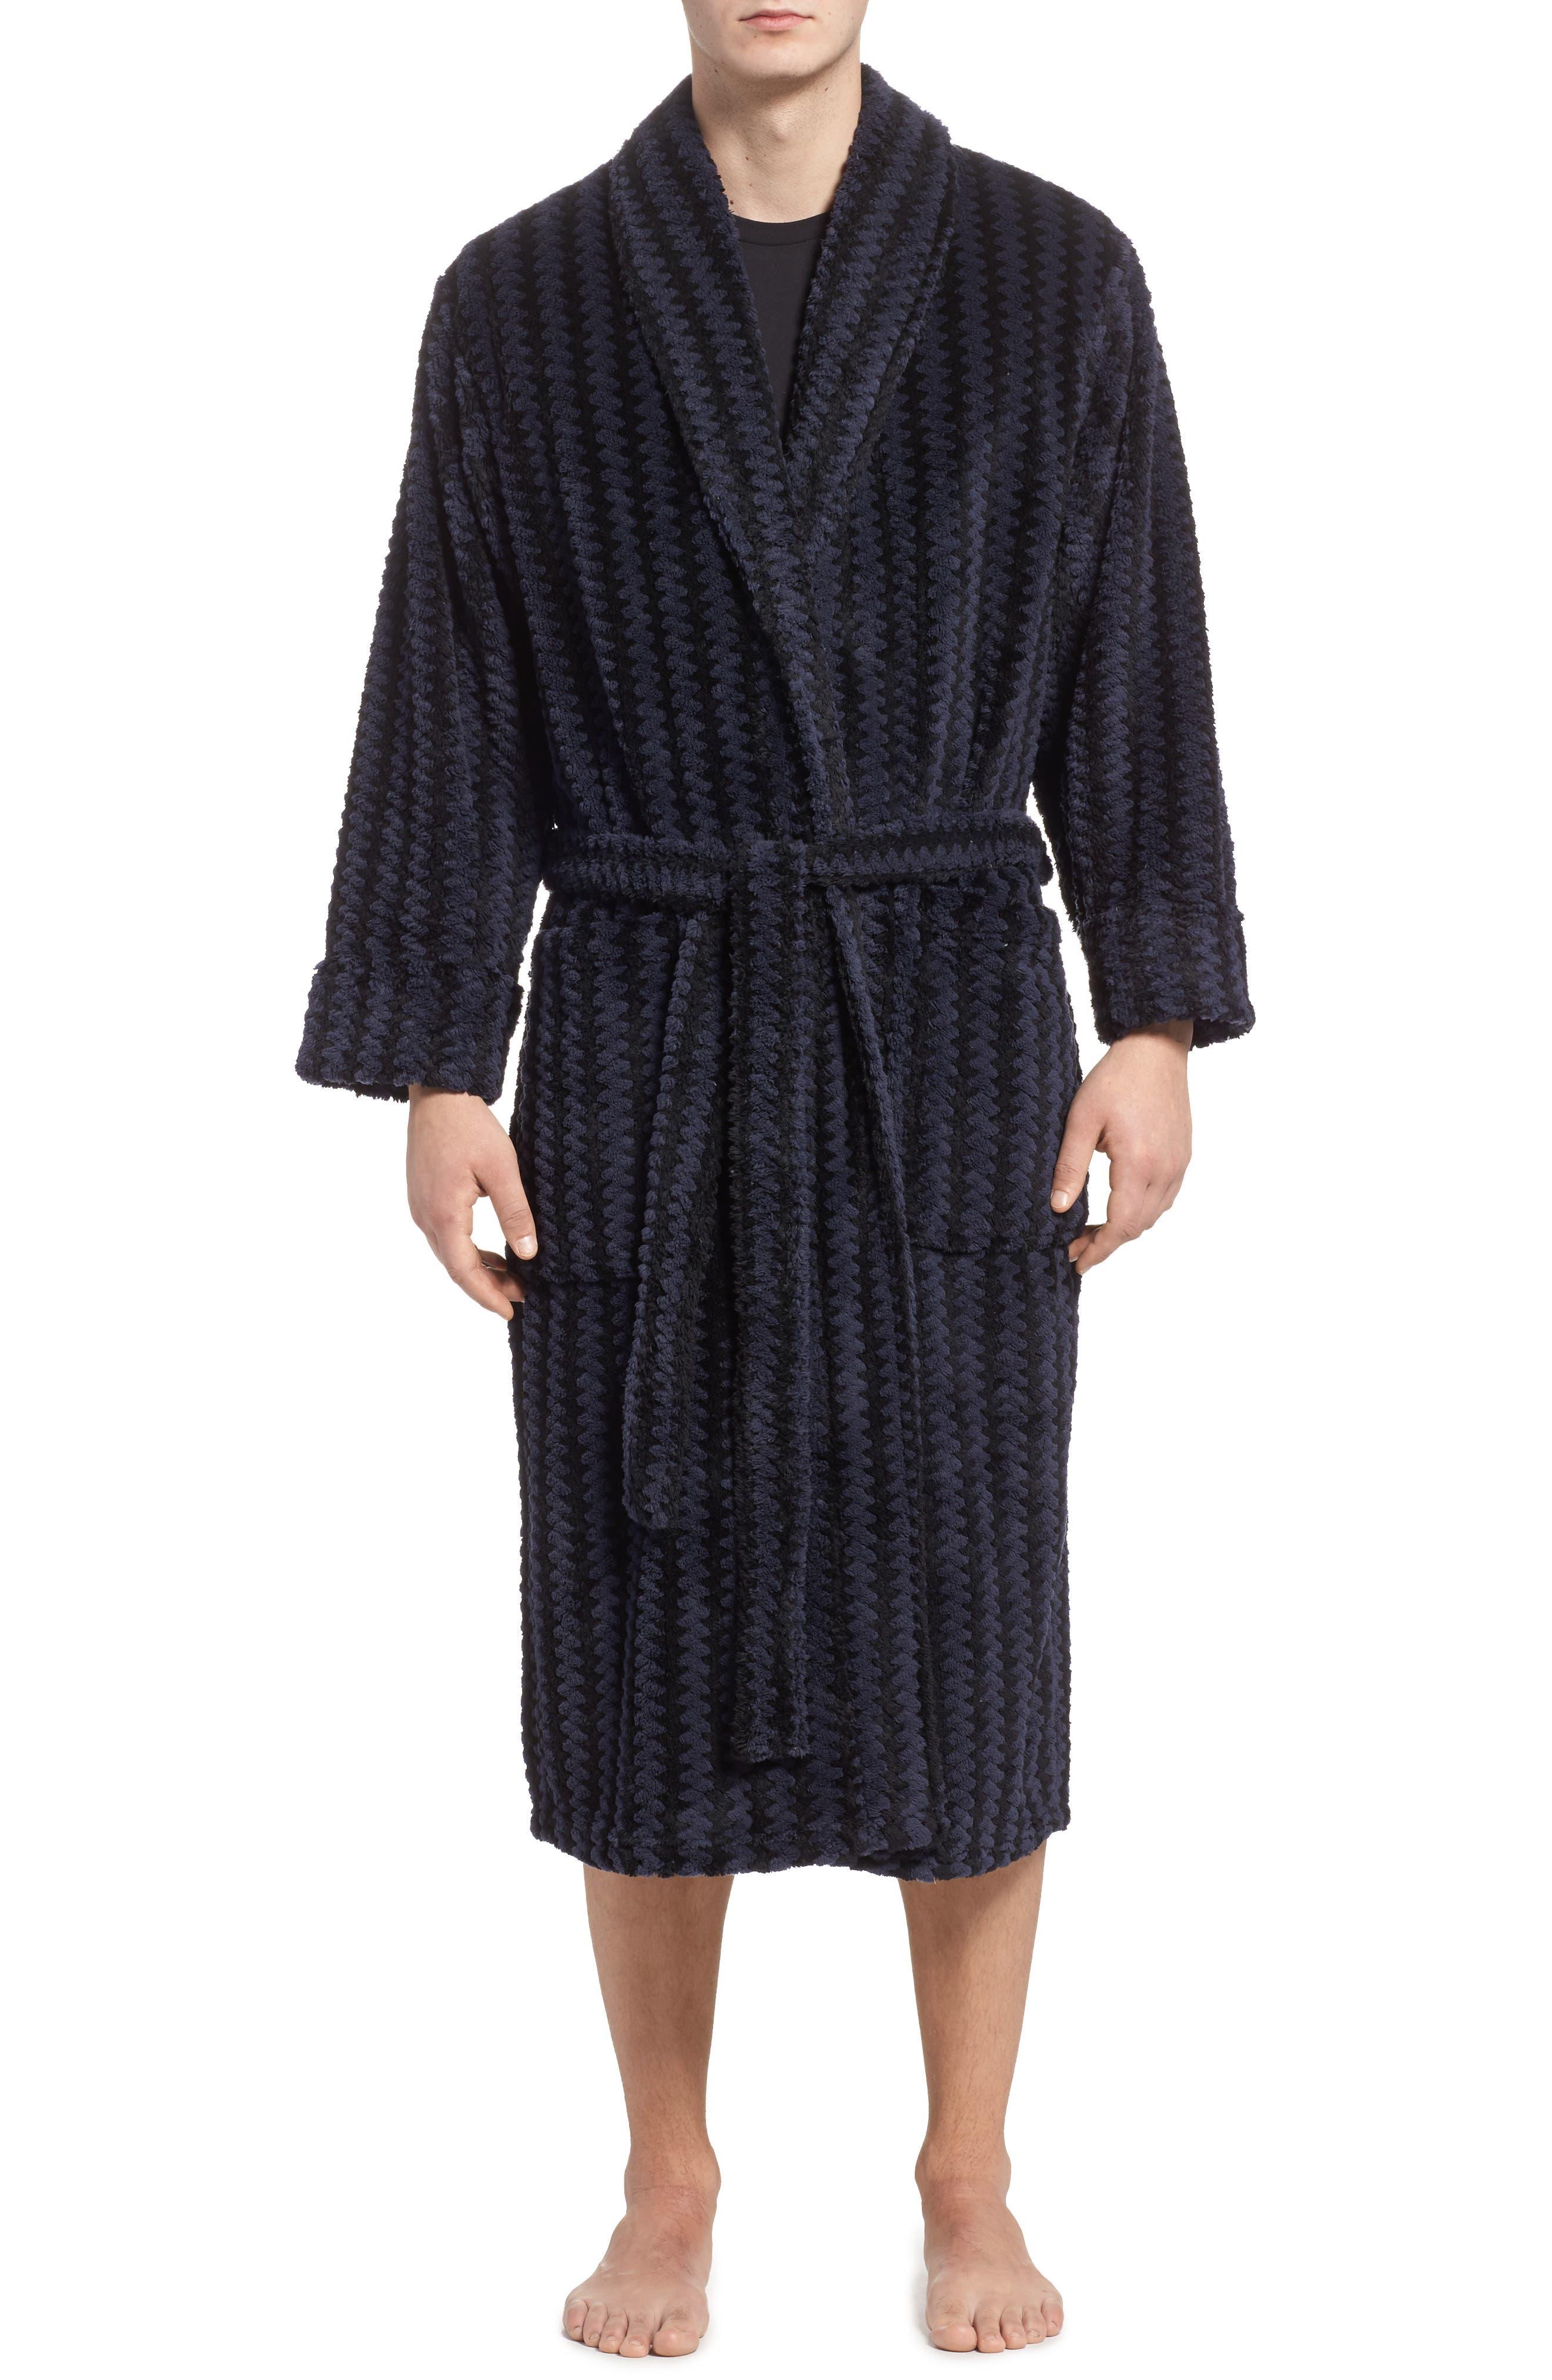 Daniel Buchler Checker Stripe Robe